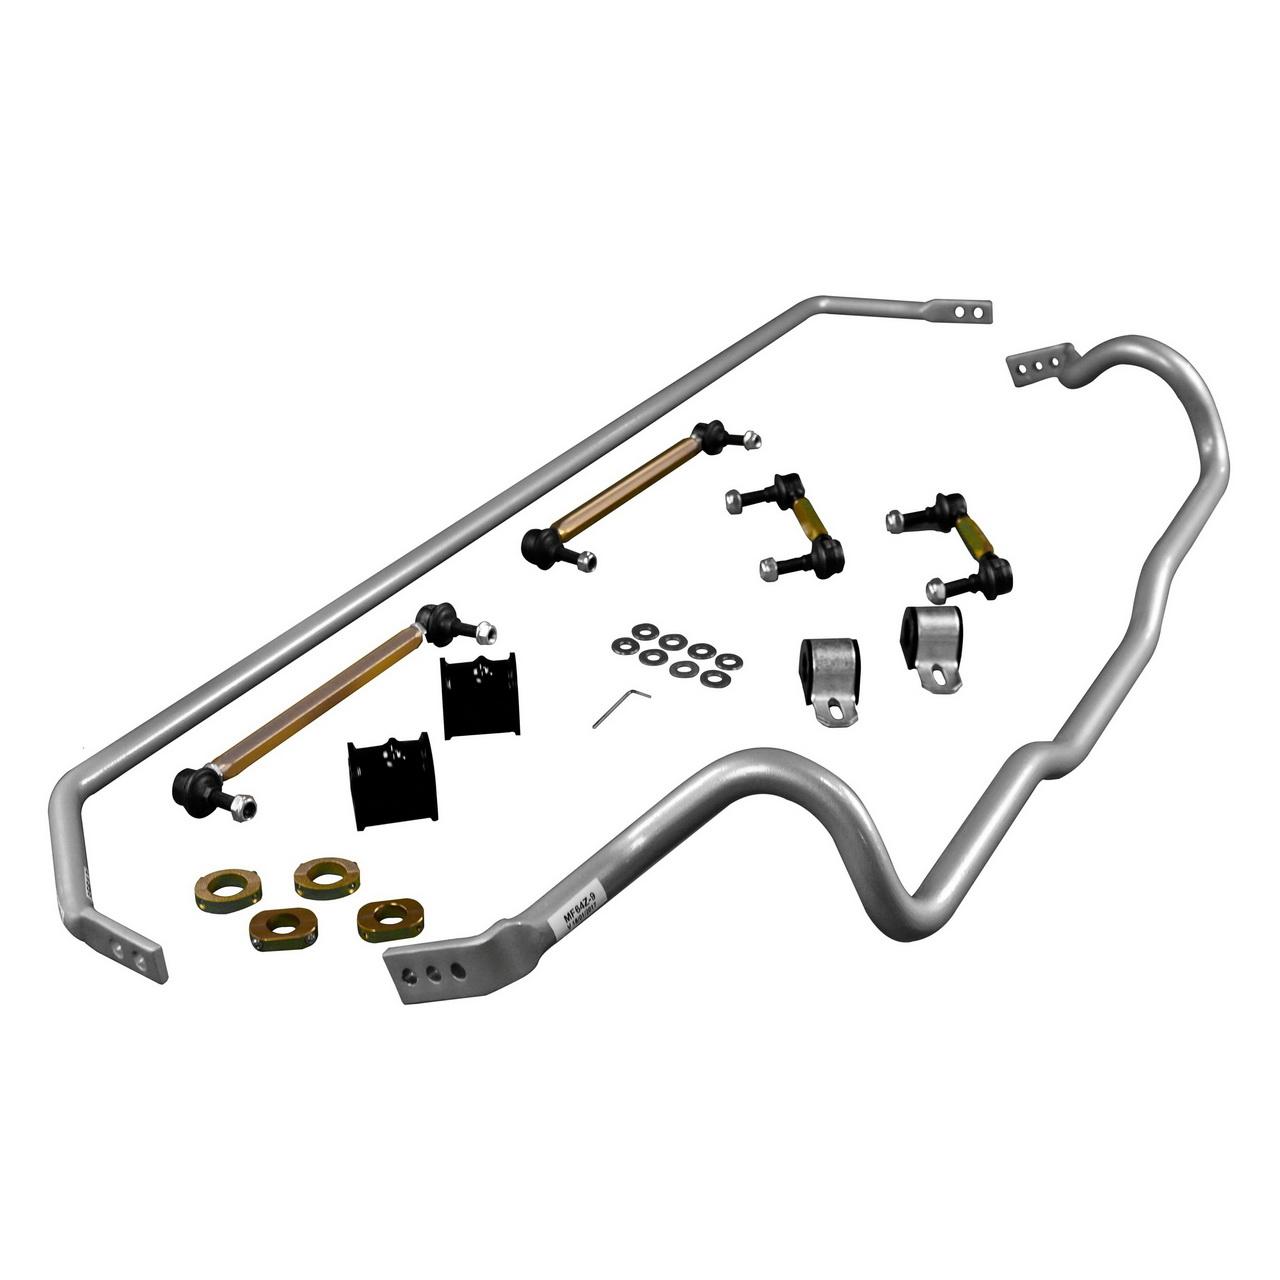 Whiteline Front Amp Rear Sway Bar Kit Focus Rs